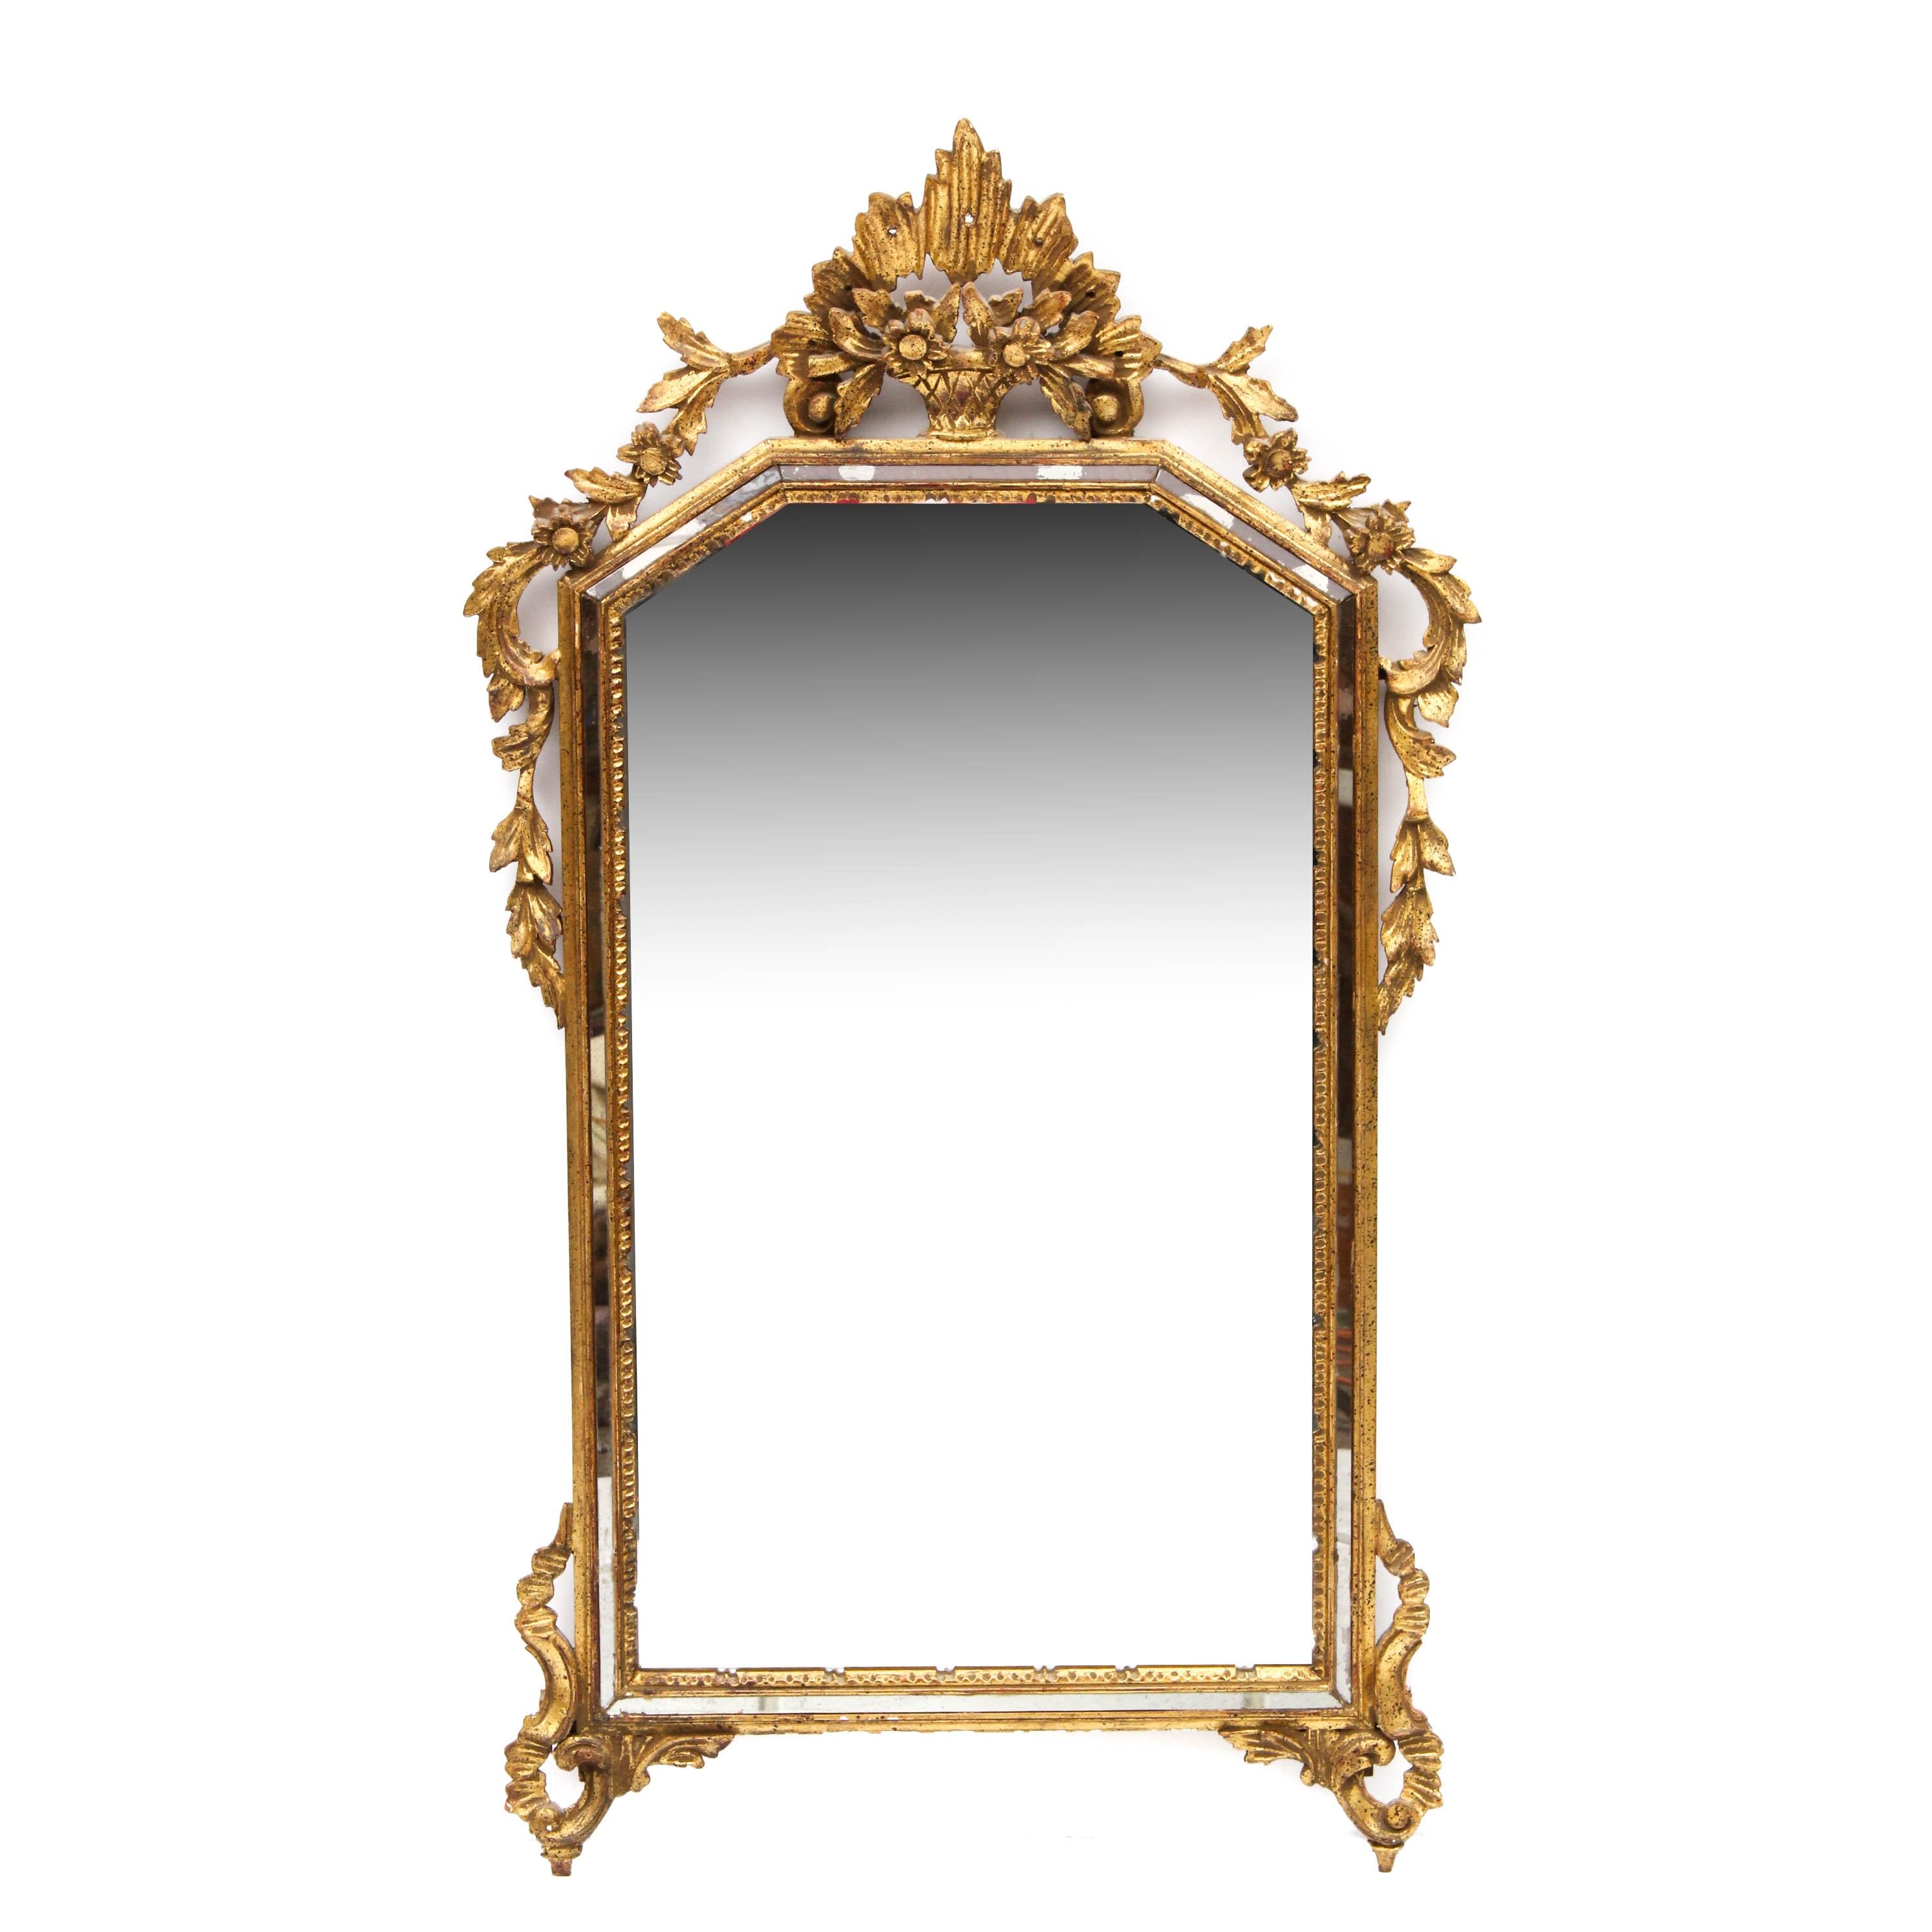 Ornate Gilt Framed Wall Mirror